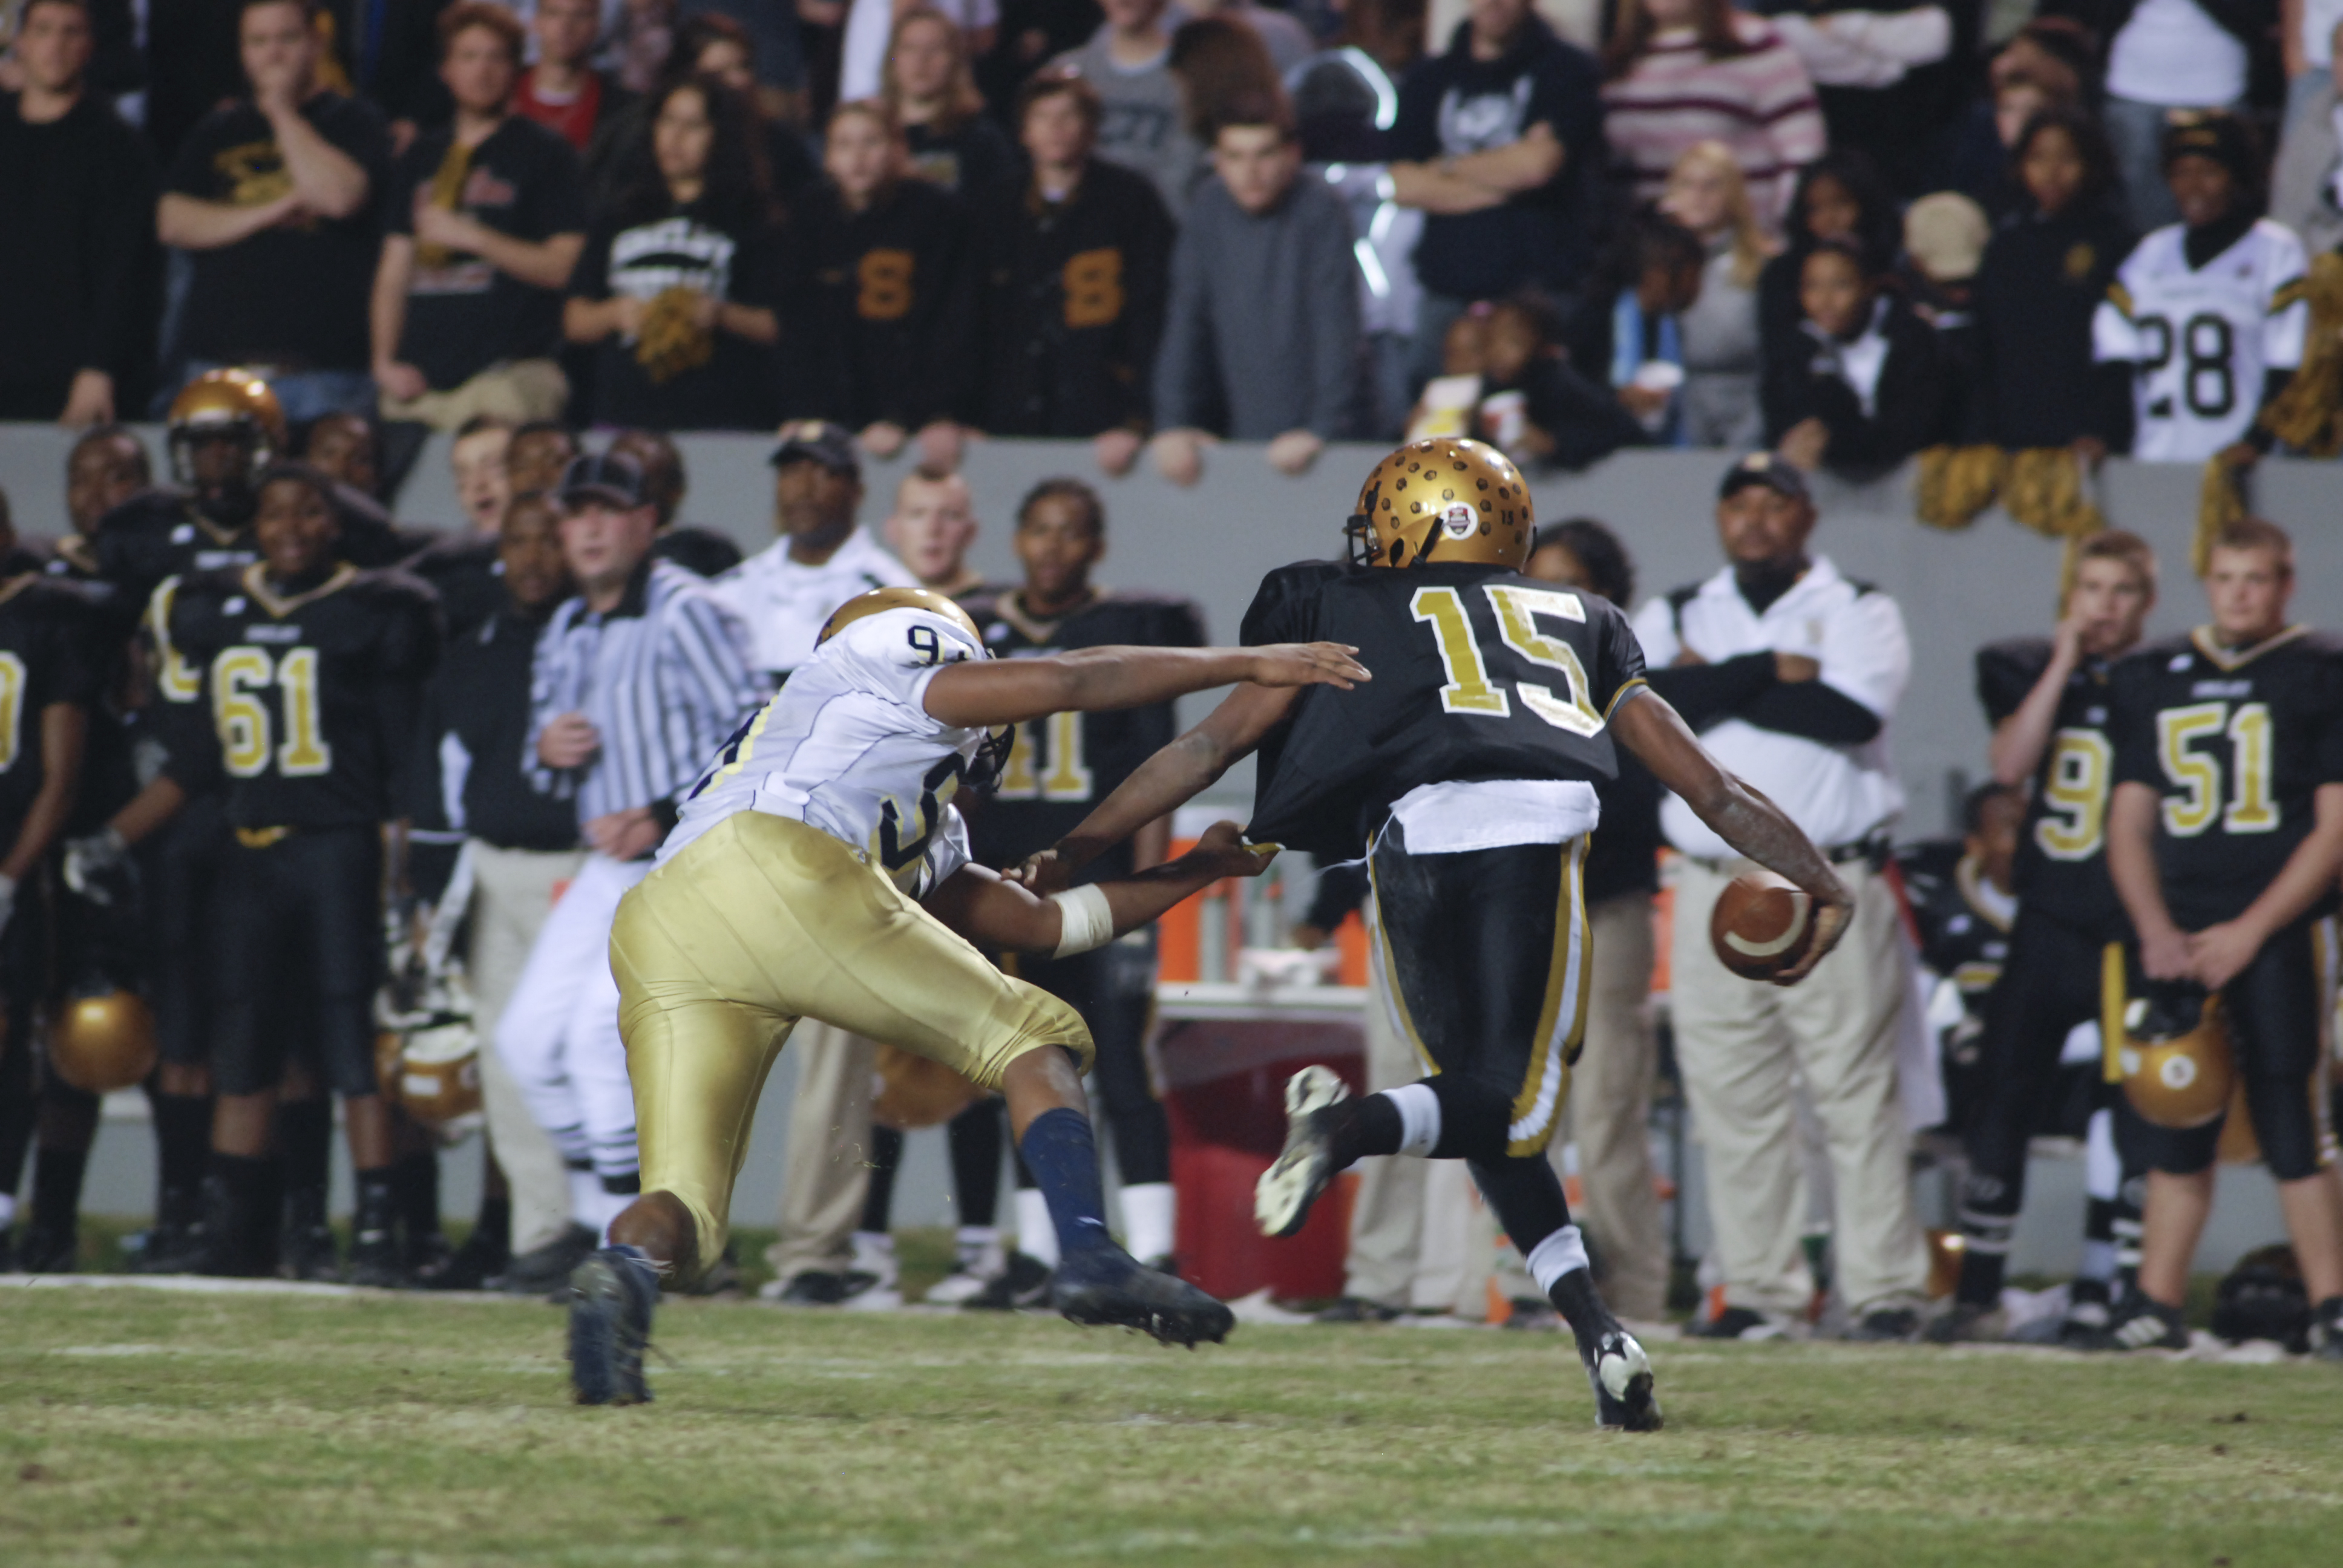 High Point Lacrosse >> Friday Night's North Carolina High School Football Scores | North Carolina High School Athletic ...